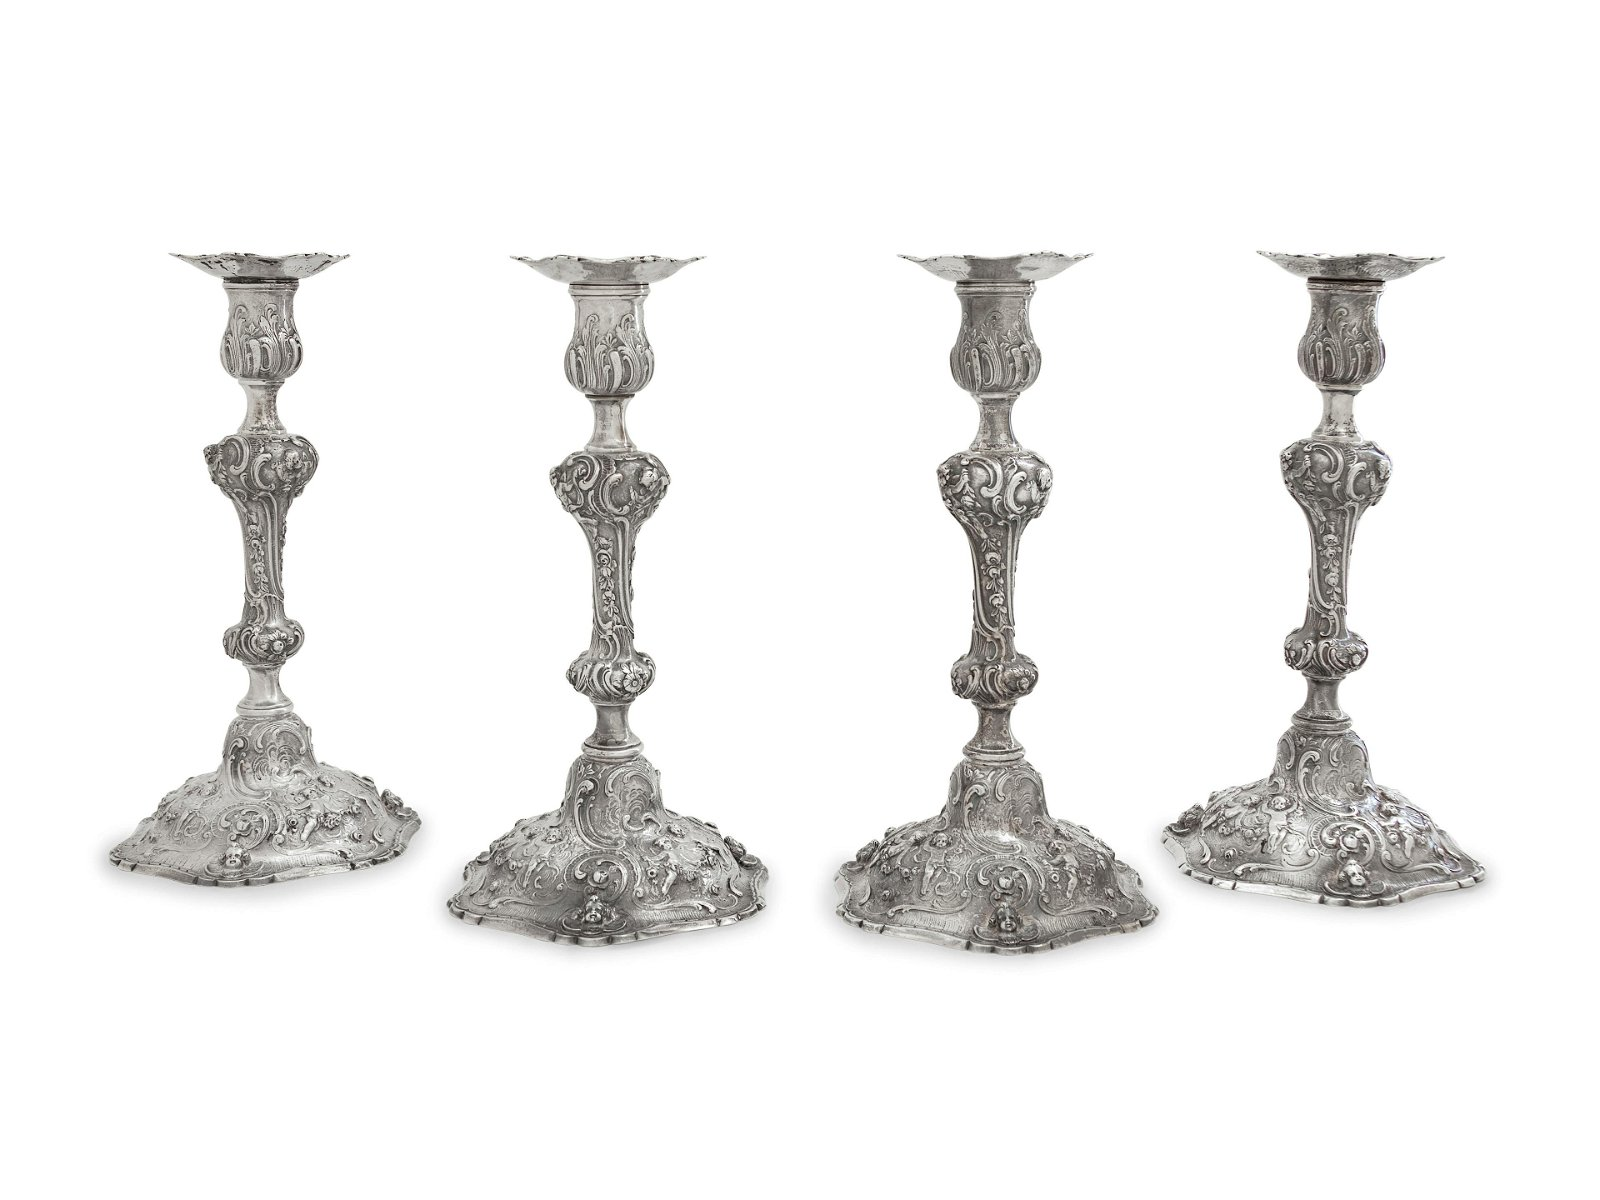 A Set of Four Rococo Revival Silver Candlesticks